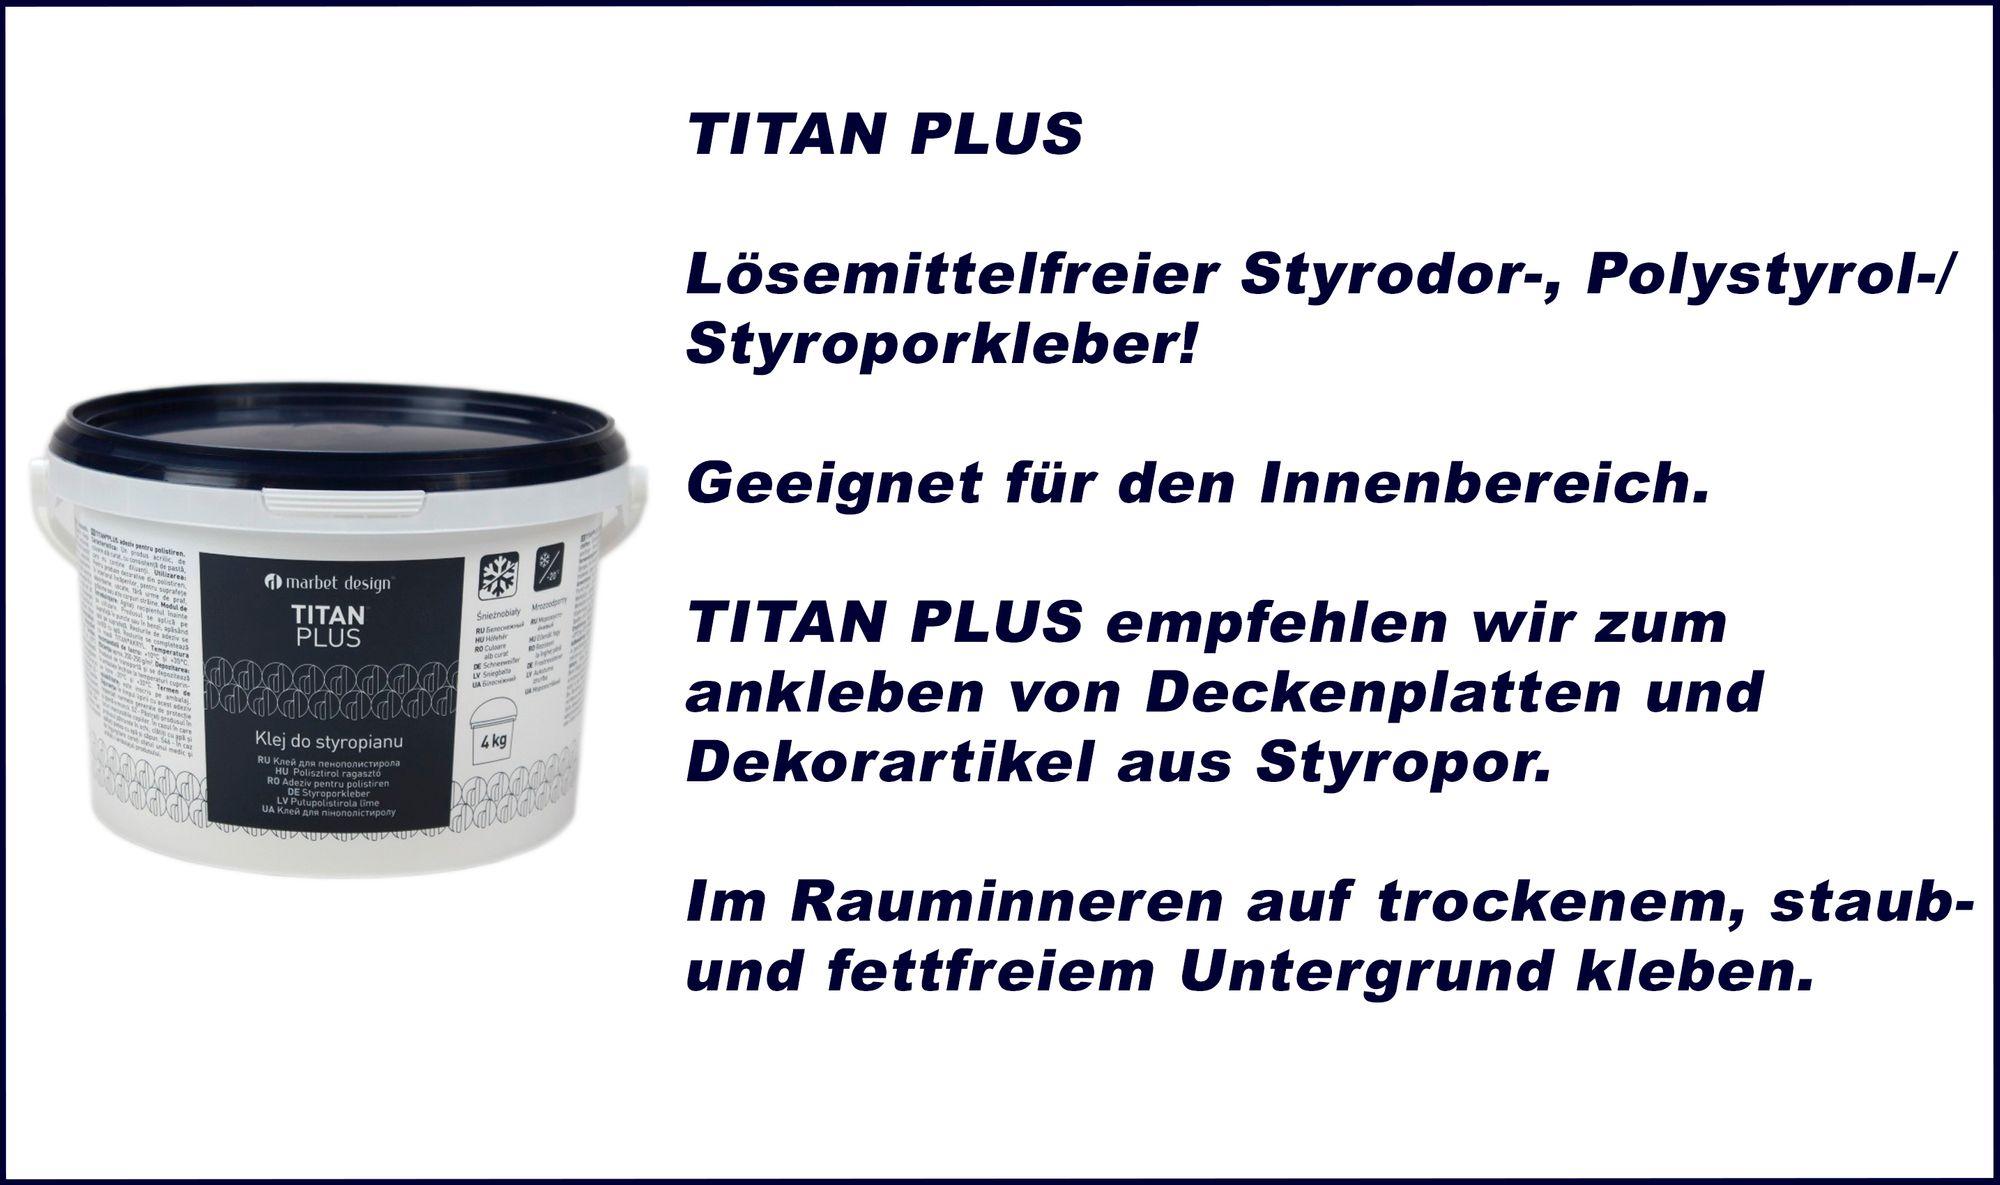 Titan Plus